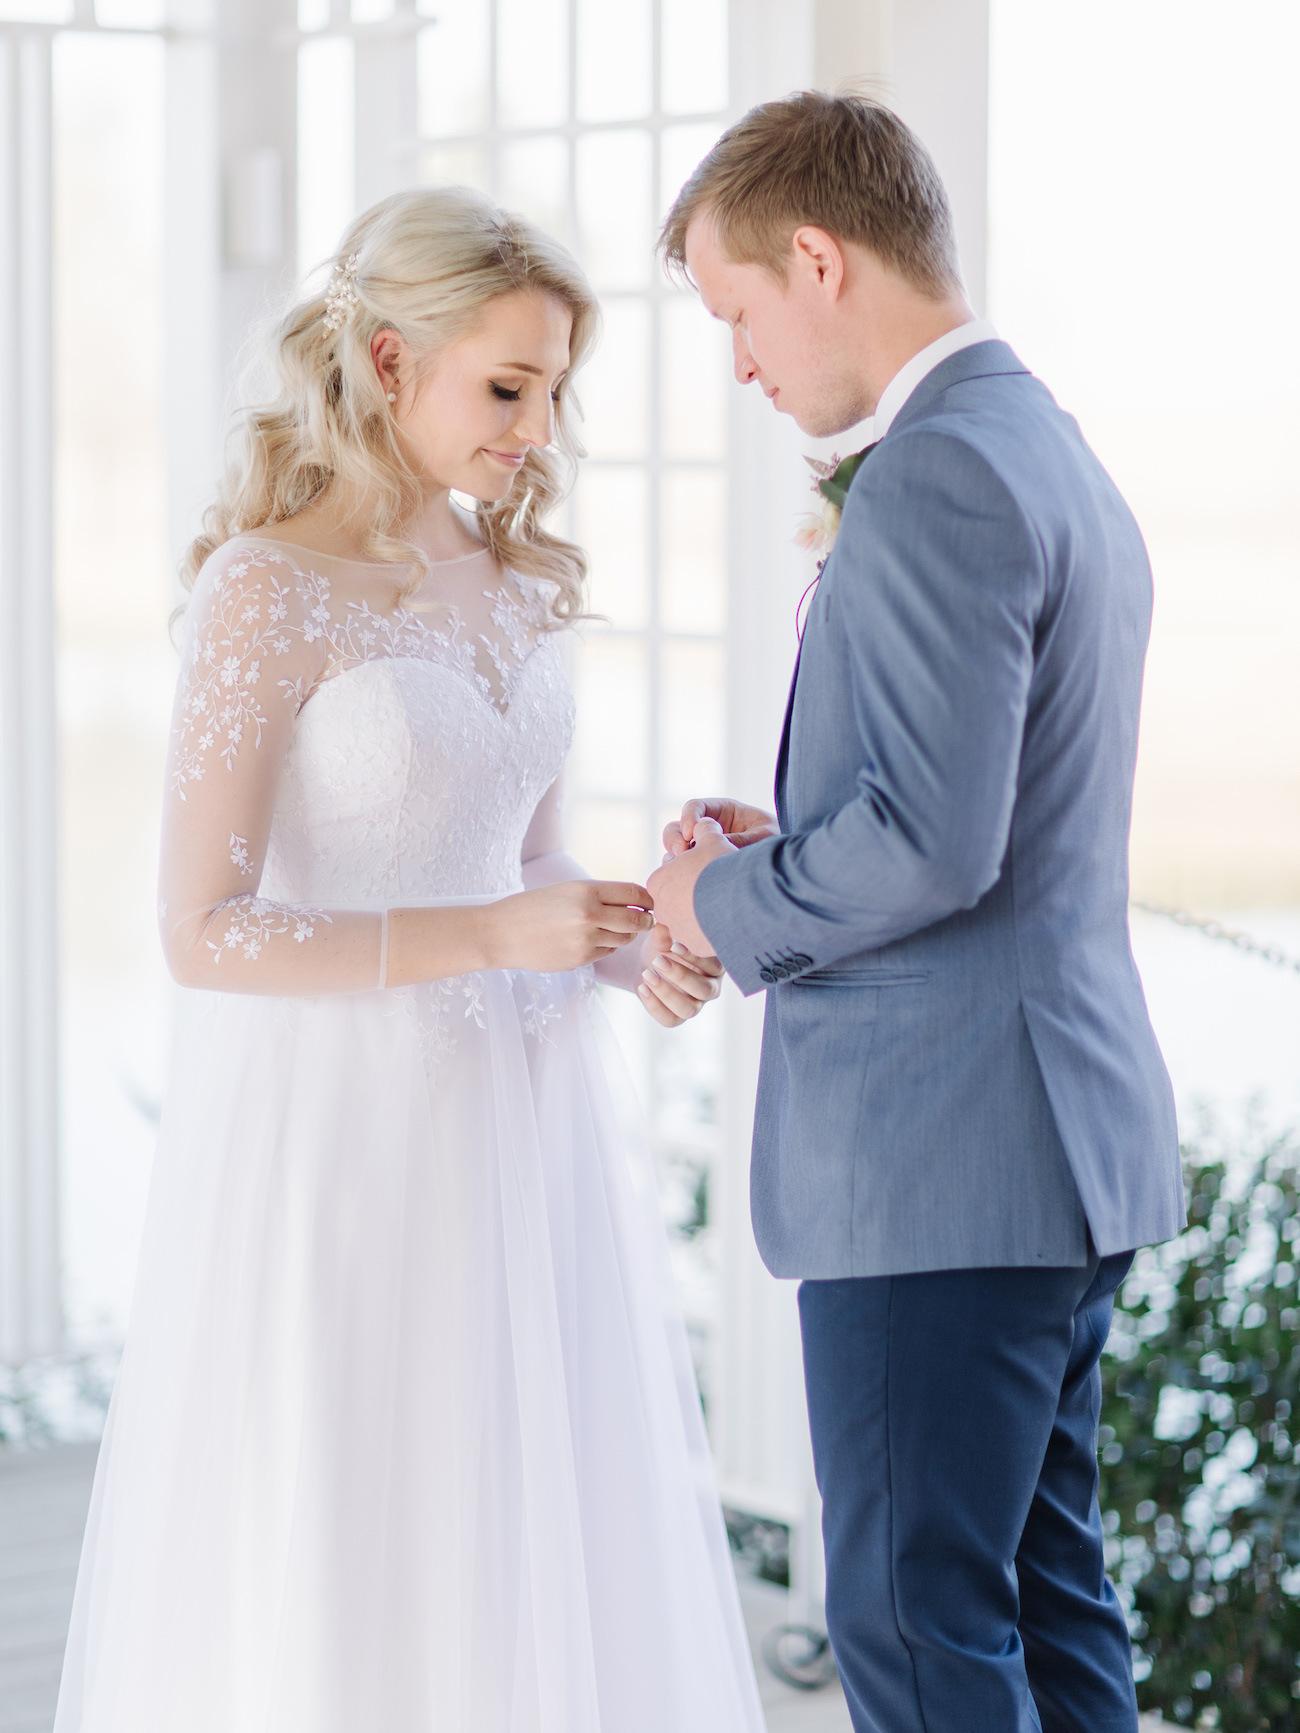 Oxbow Country Estate Wedding Ceremony | Image: Rensche Mari